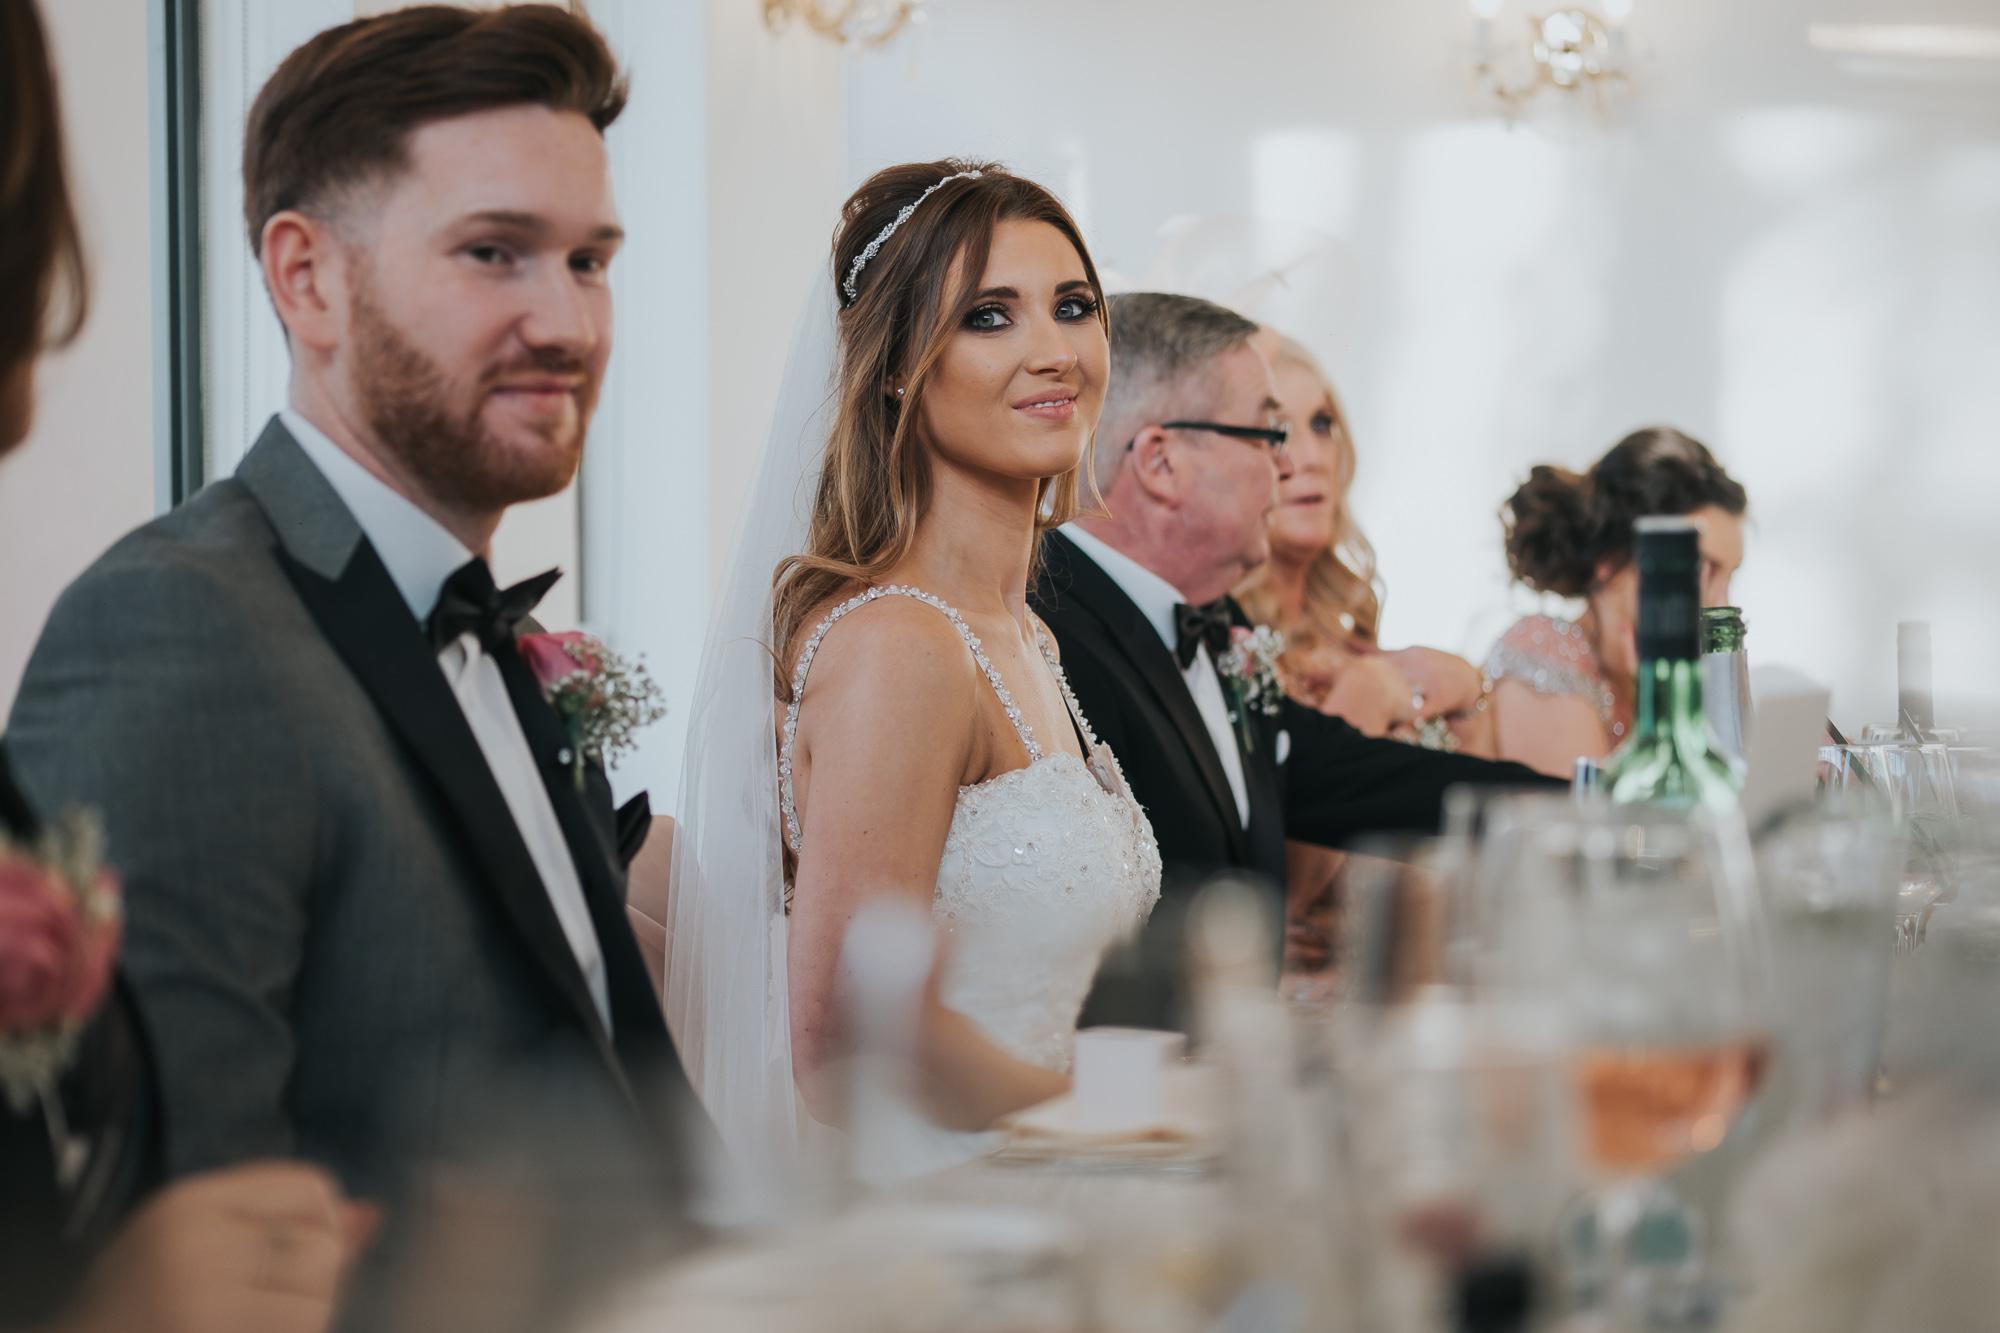 West Tower Exclusive Wedding Venue wedding photography merseyside and lancashire wedding photographer (46 of 60).jpg